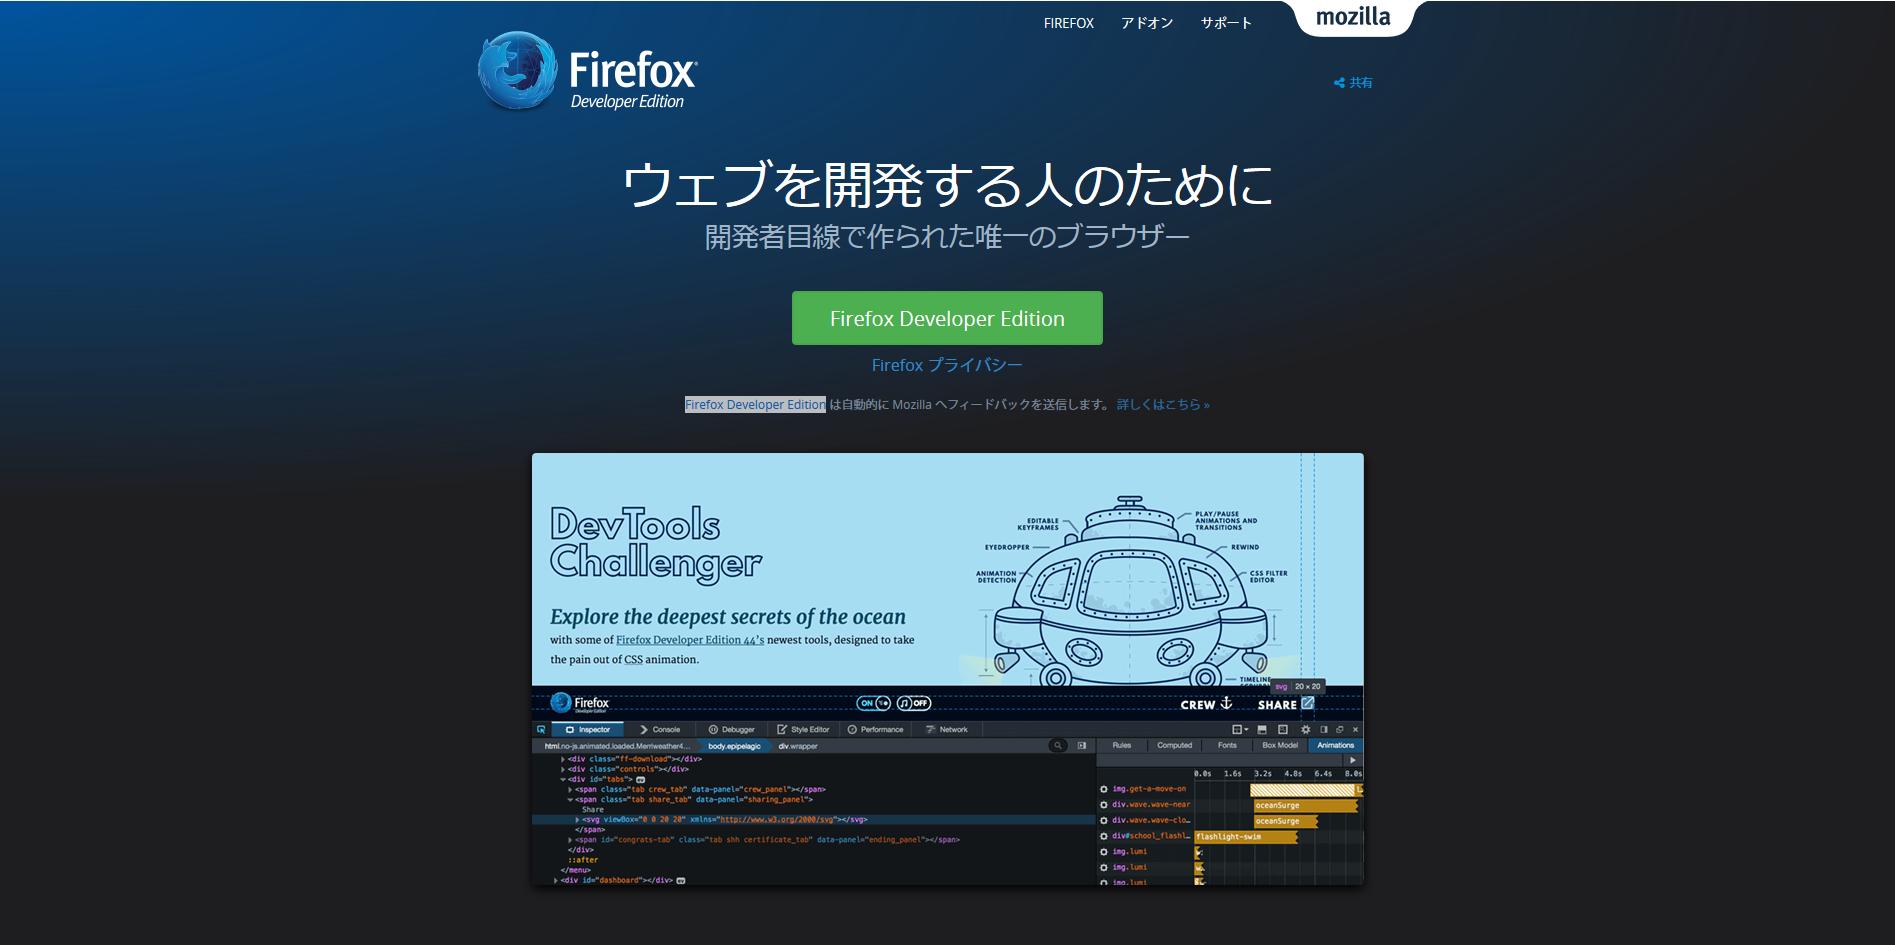 Firefox Developer Editionの画像